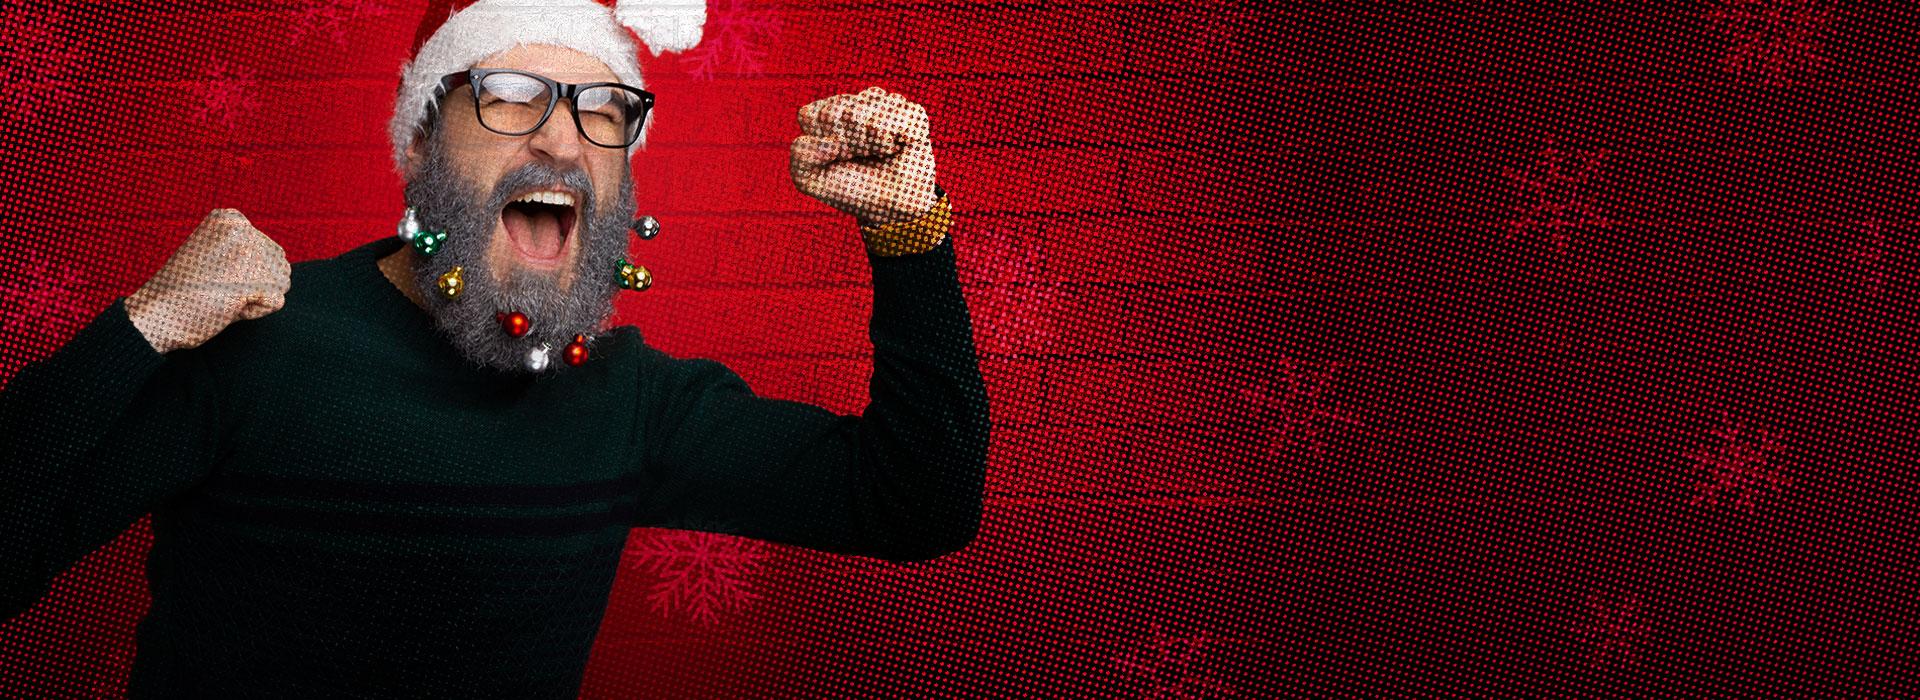 Fond Burger de Noël - Le hohoho